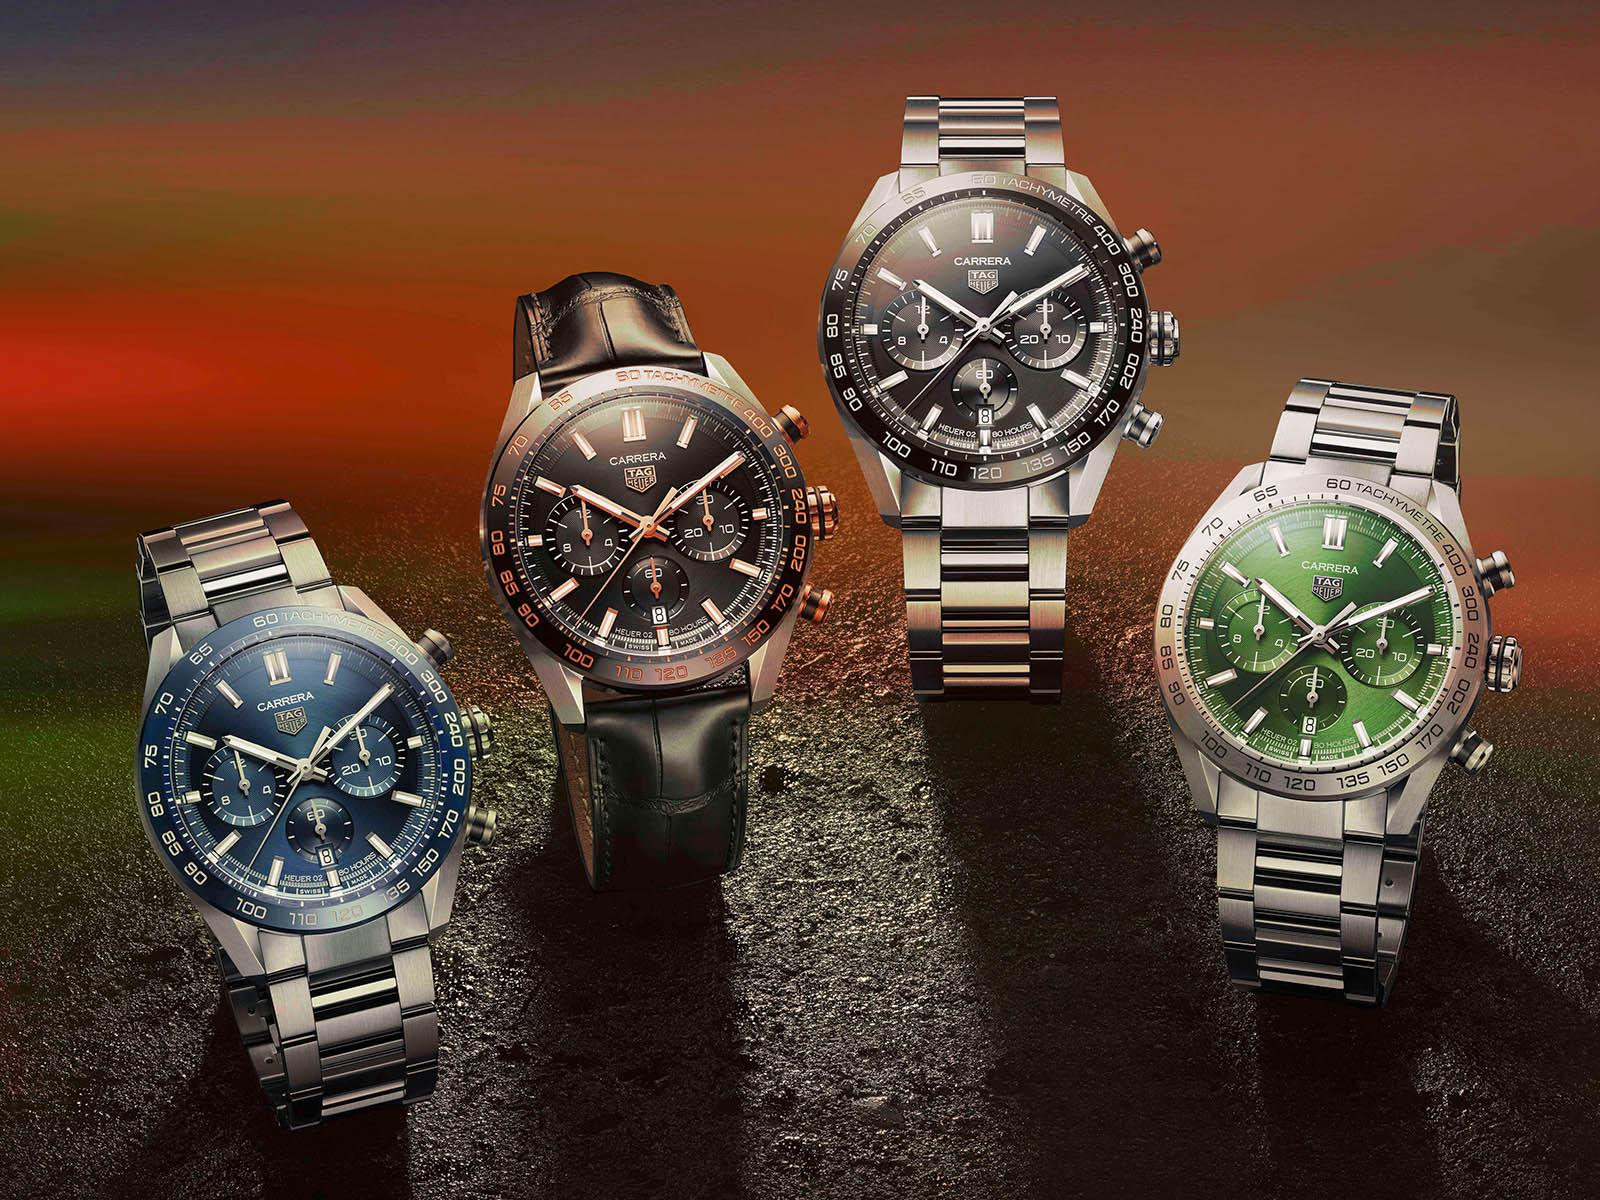 tag-heuer-carrera-sport-chronograph-44mm-calibre-heuer-02-automatic-1.jpg